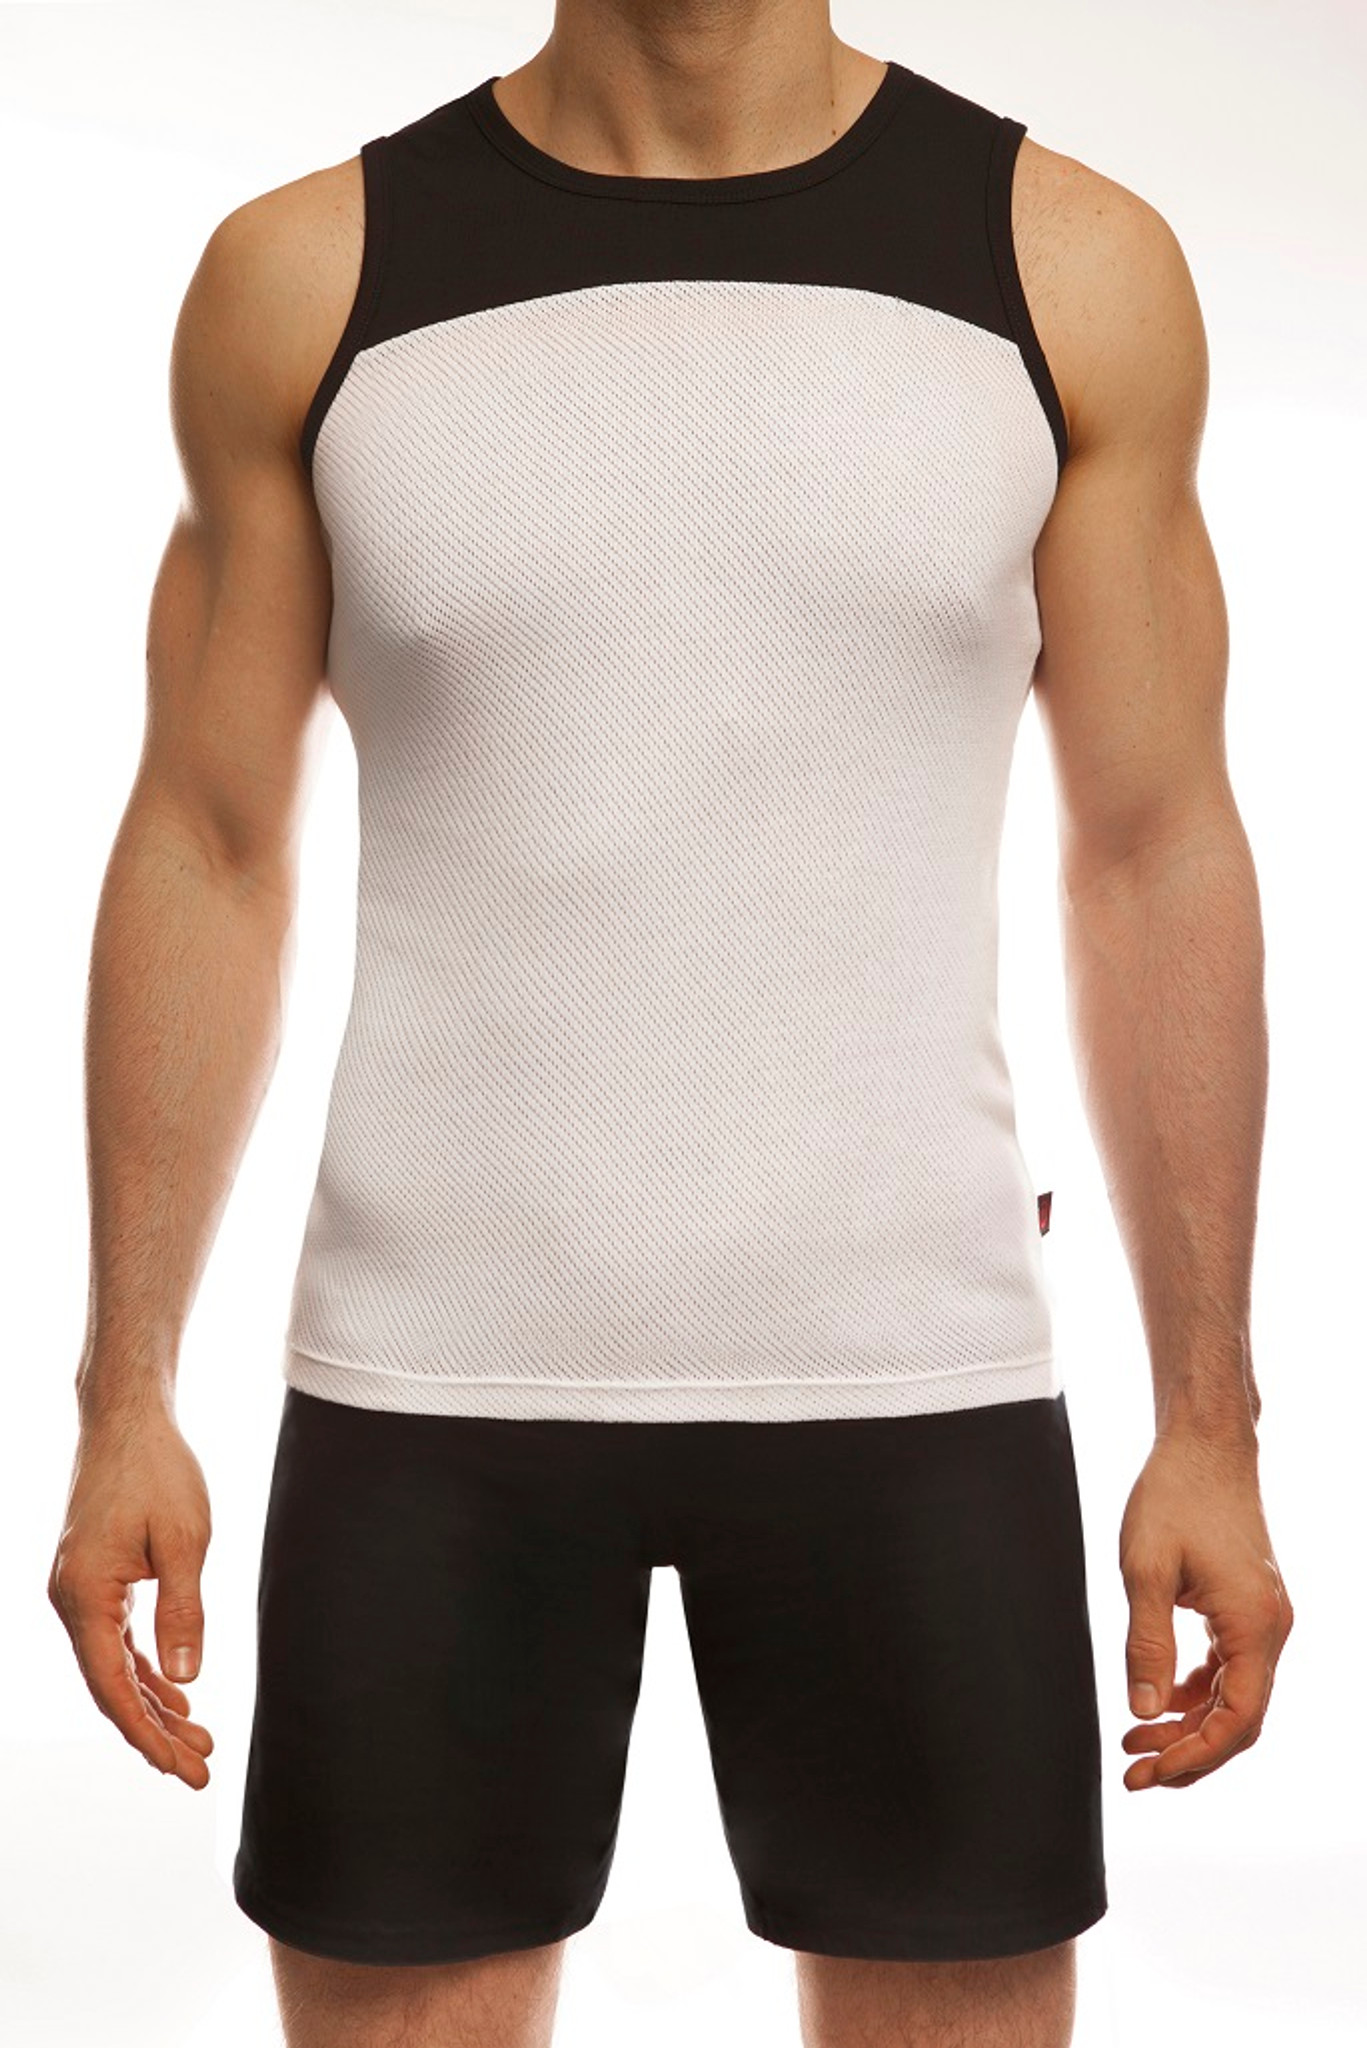 Jack Adams USA Nano Muscle Tank Top